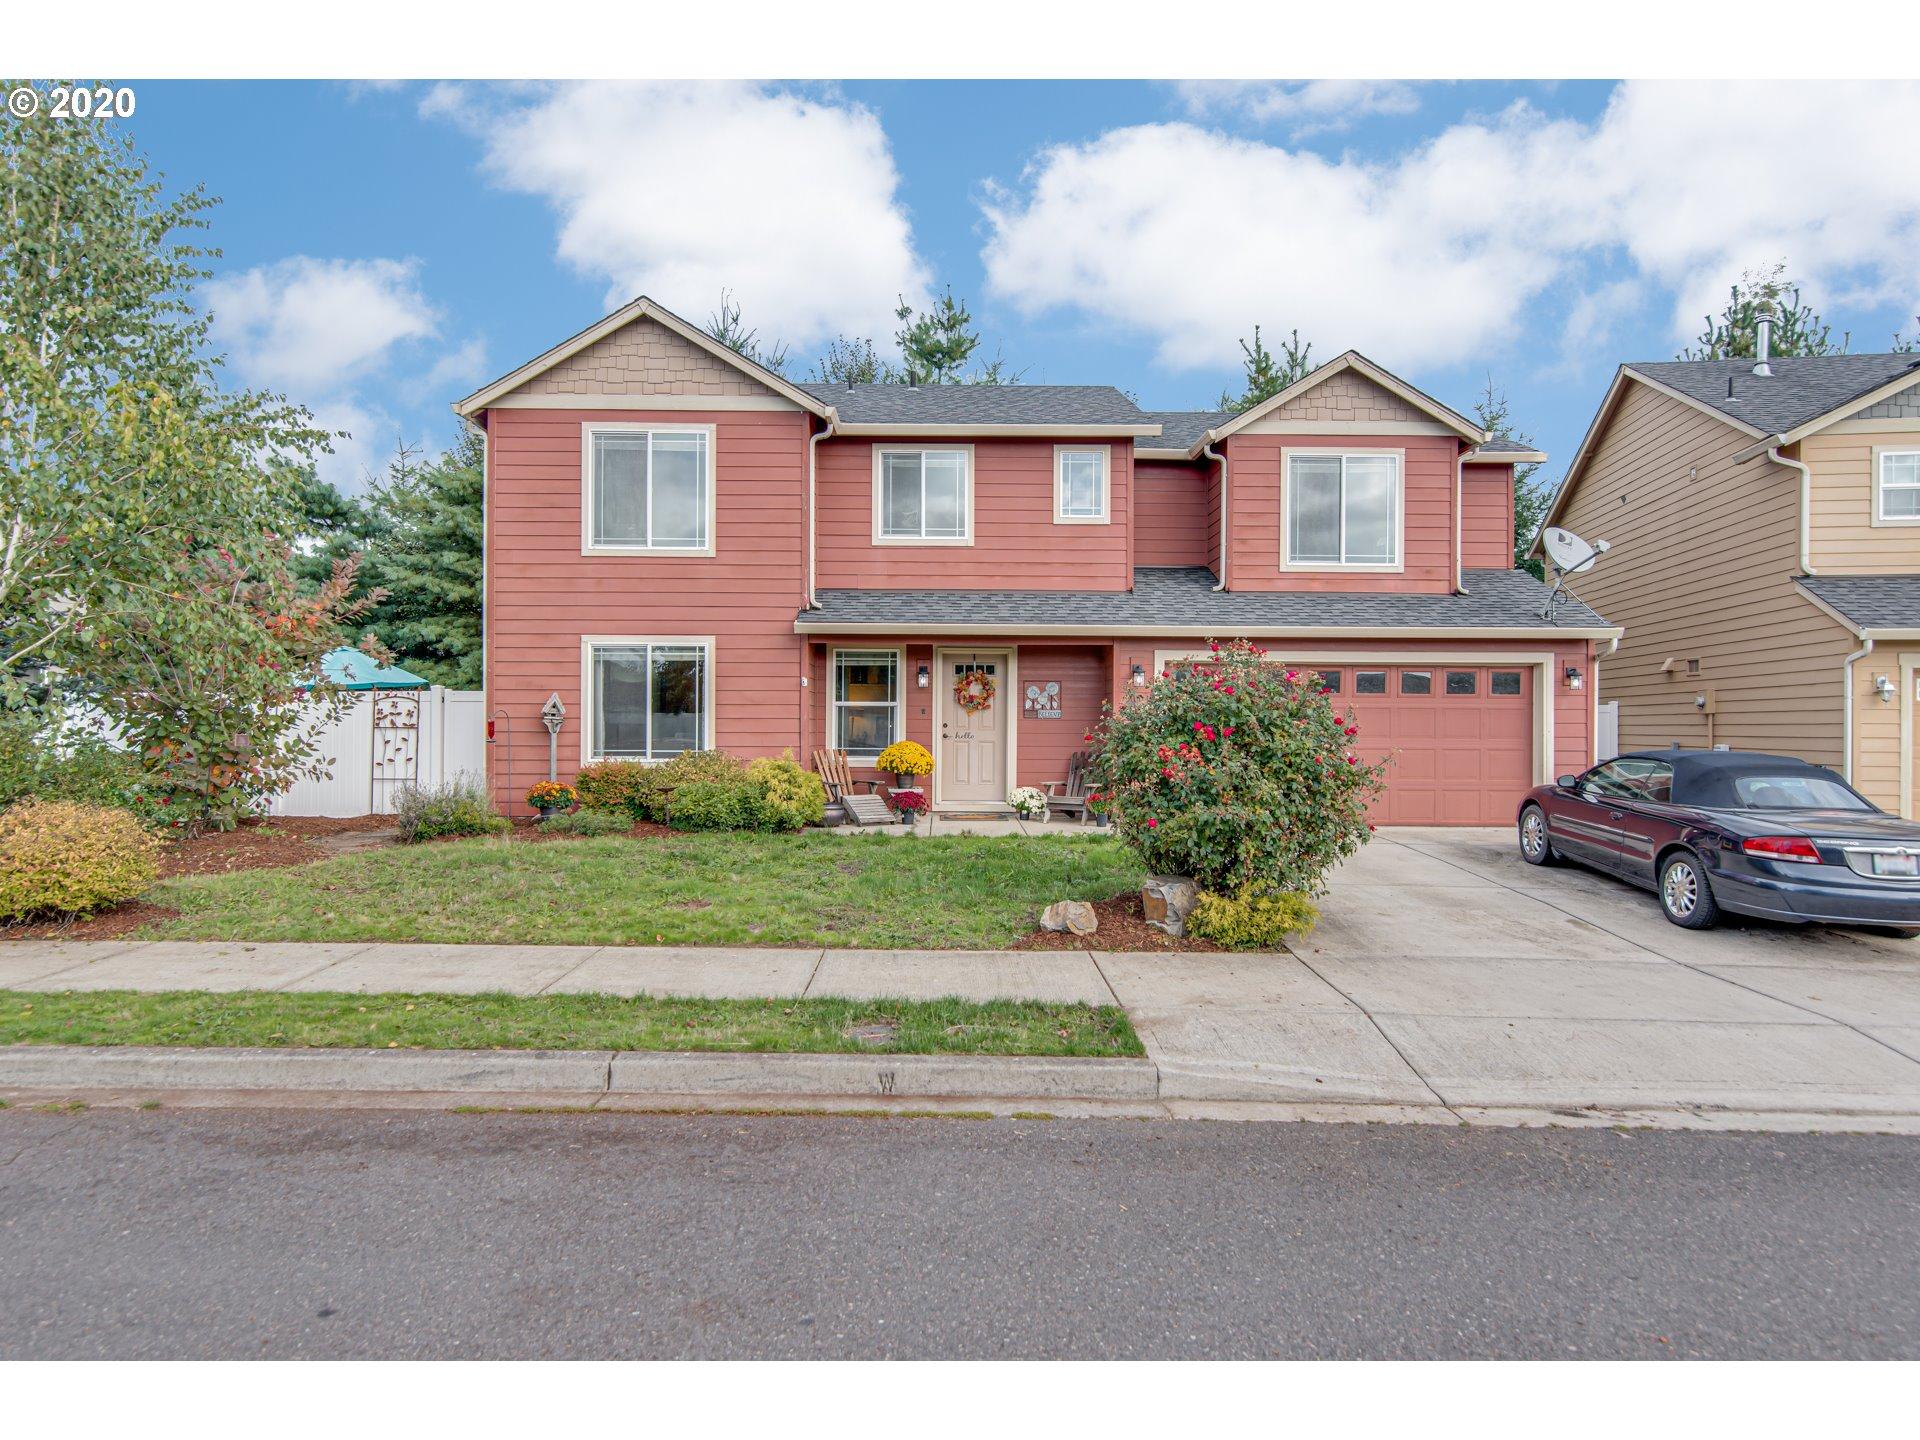 5010 NE 61st St, Vancouver, WA 98661